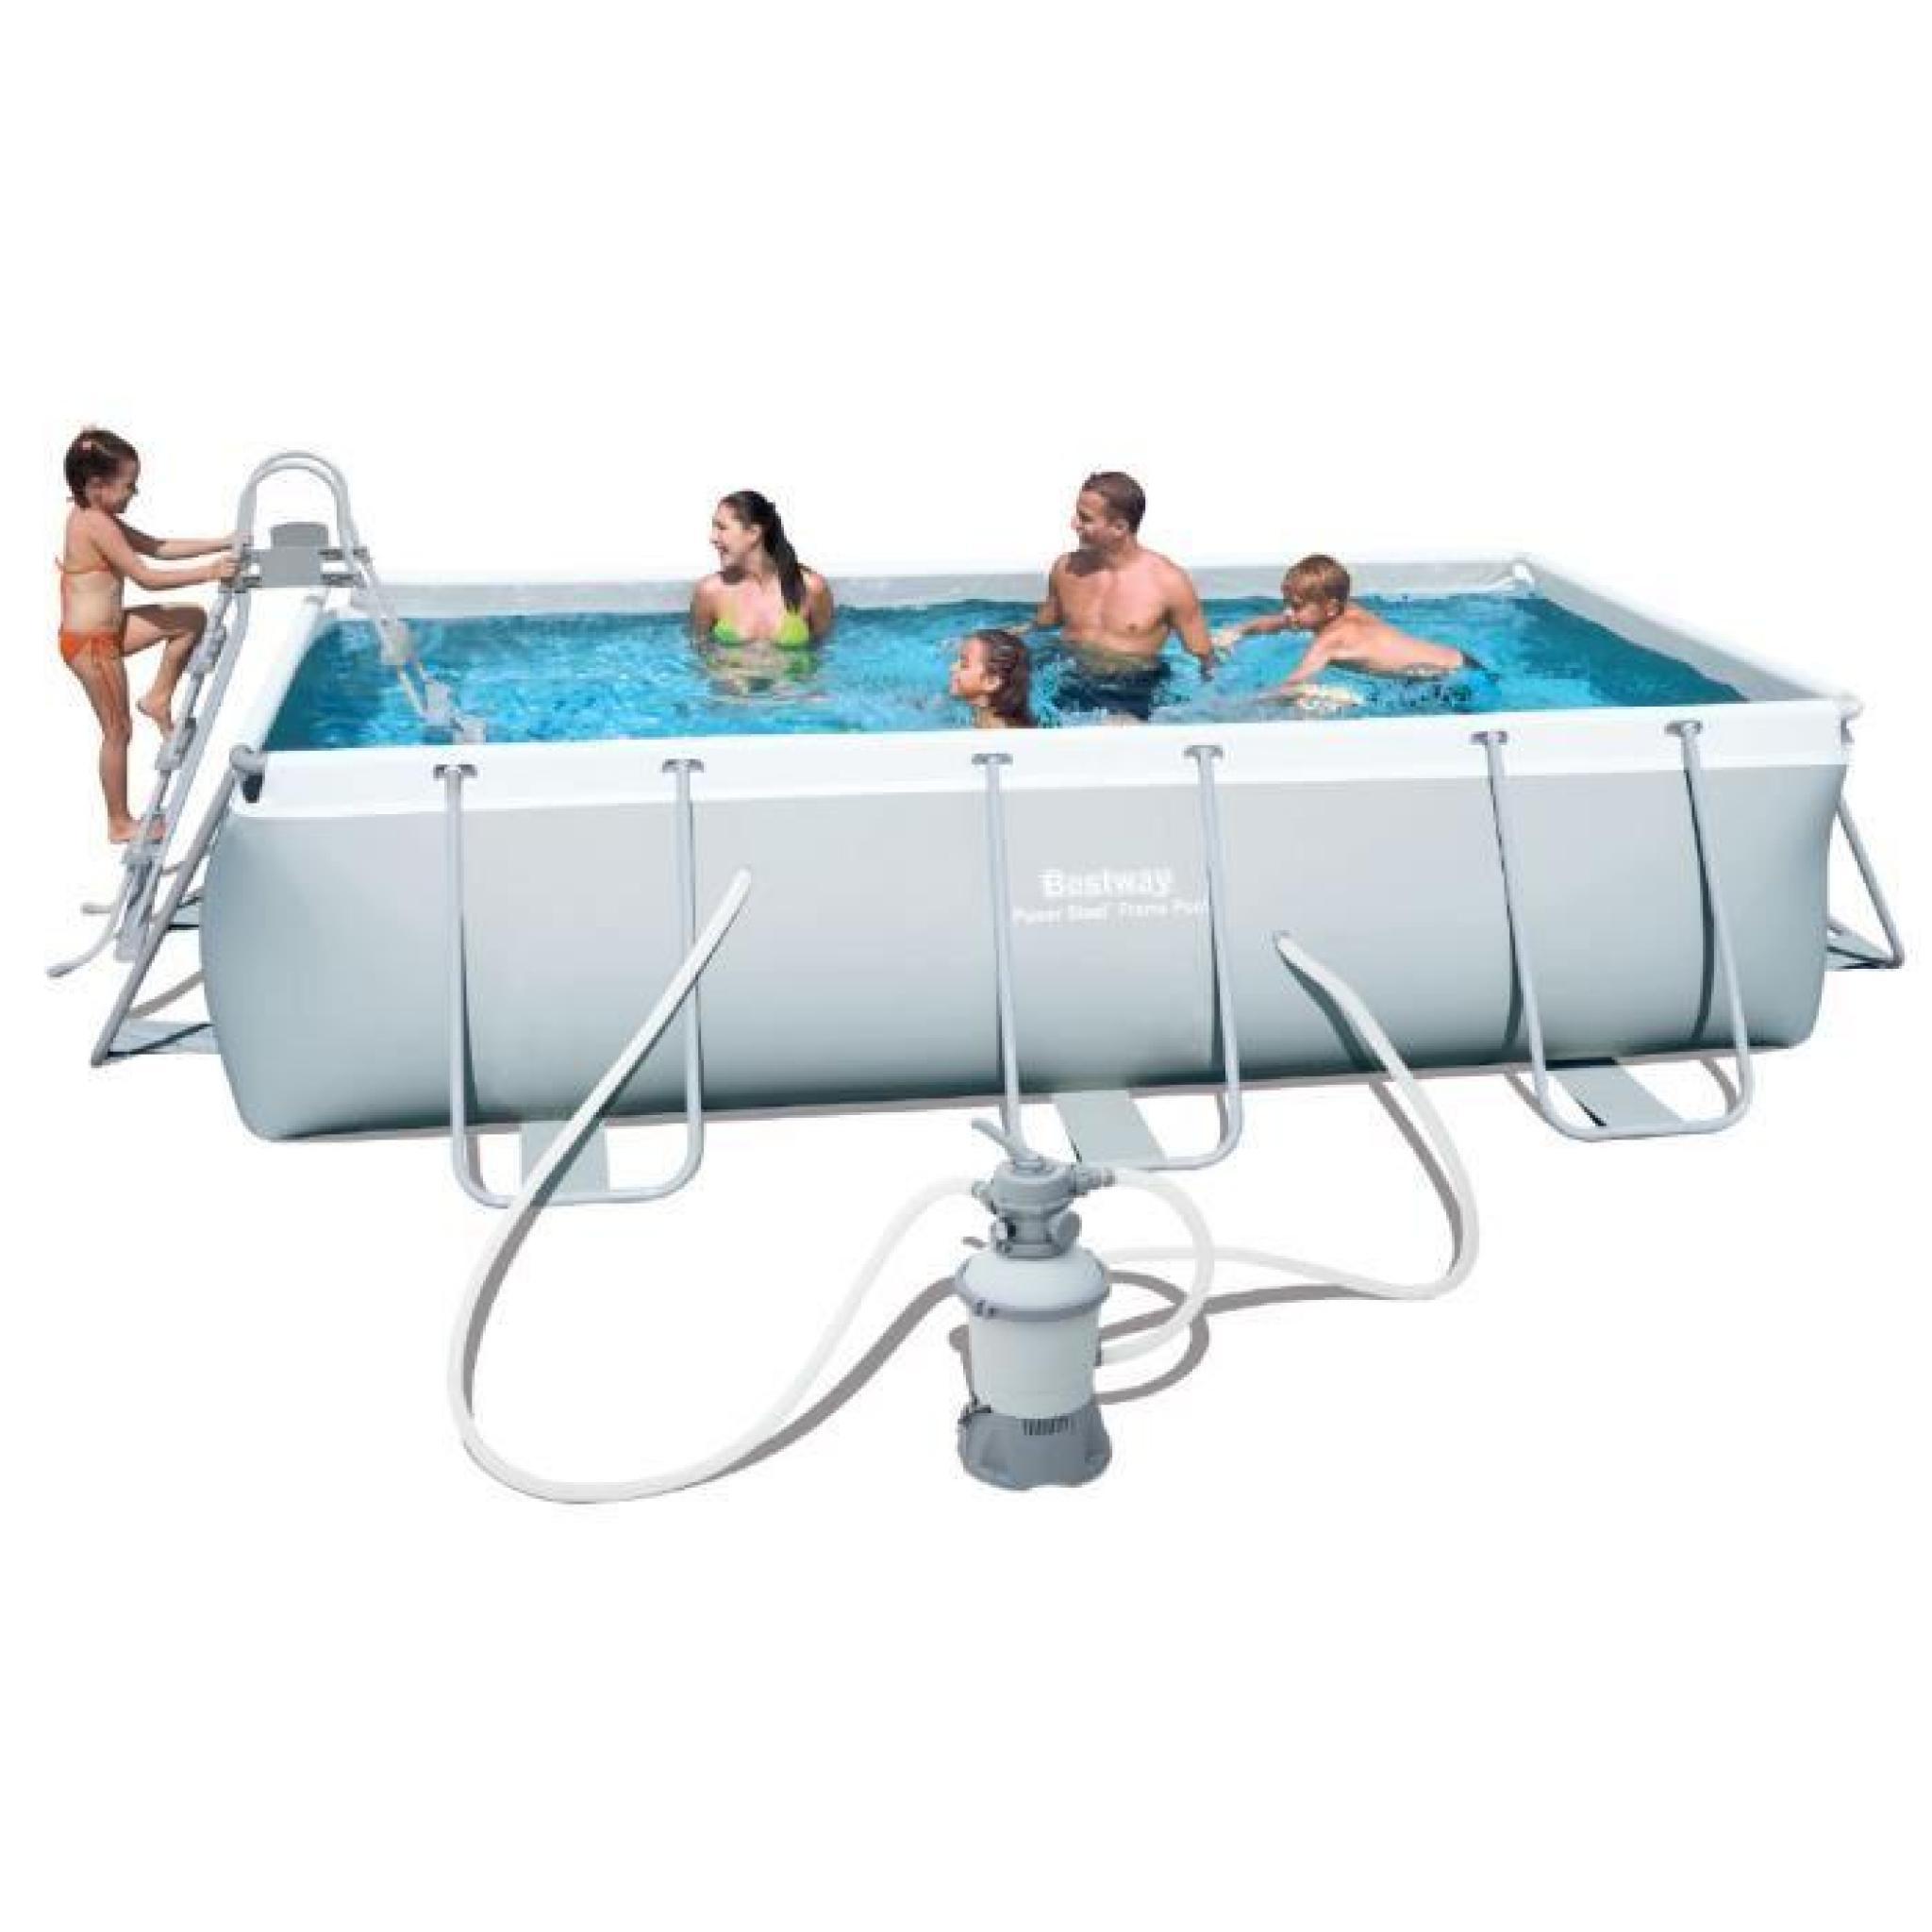 piscine tubulaire rectangulaire bestway filtre sable achat vente piscine hors. Black Bedroom Furniture Sets. Home Design Ideas